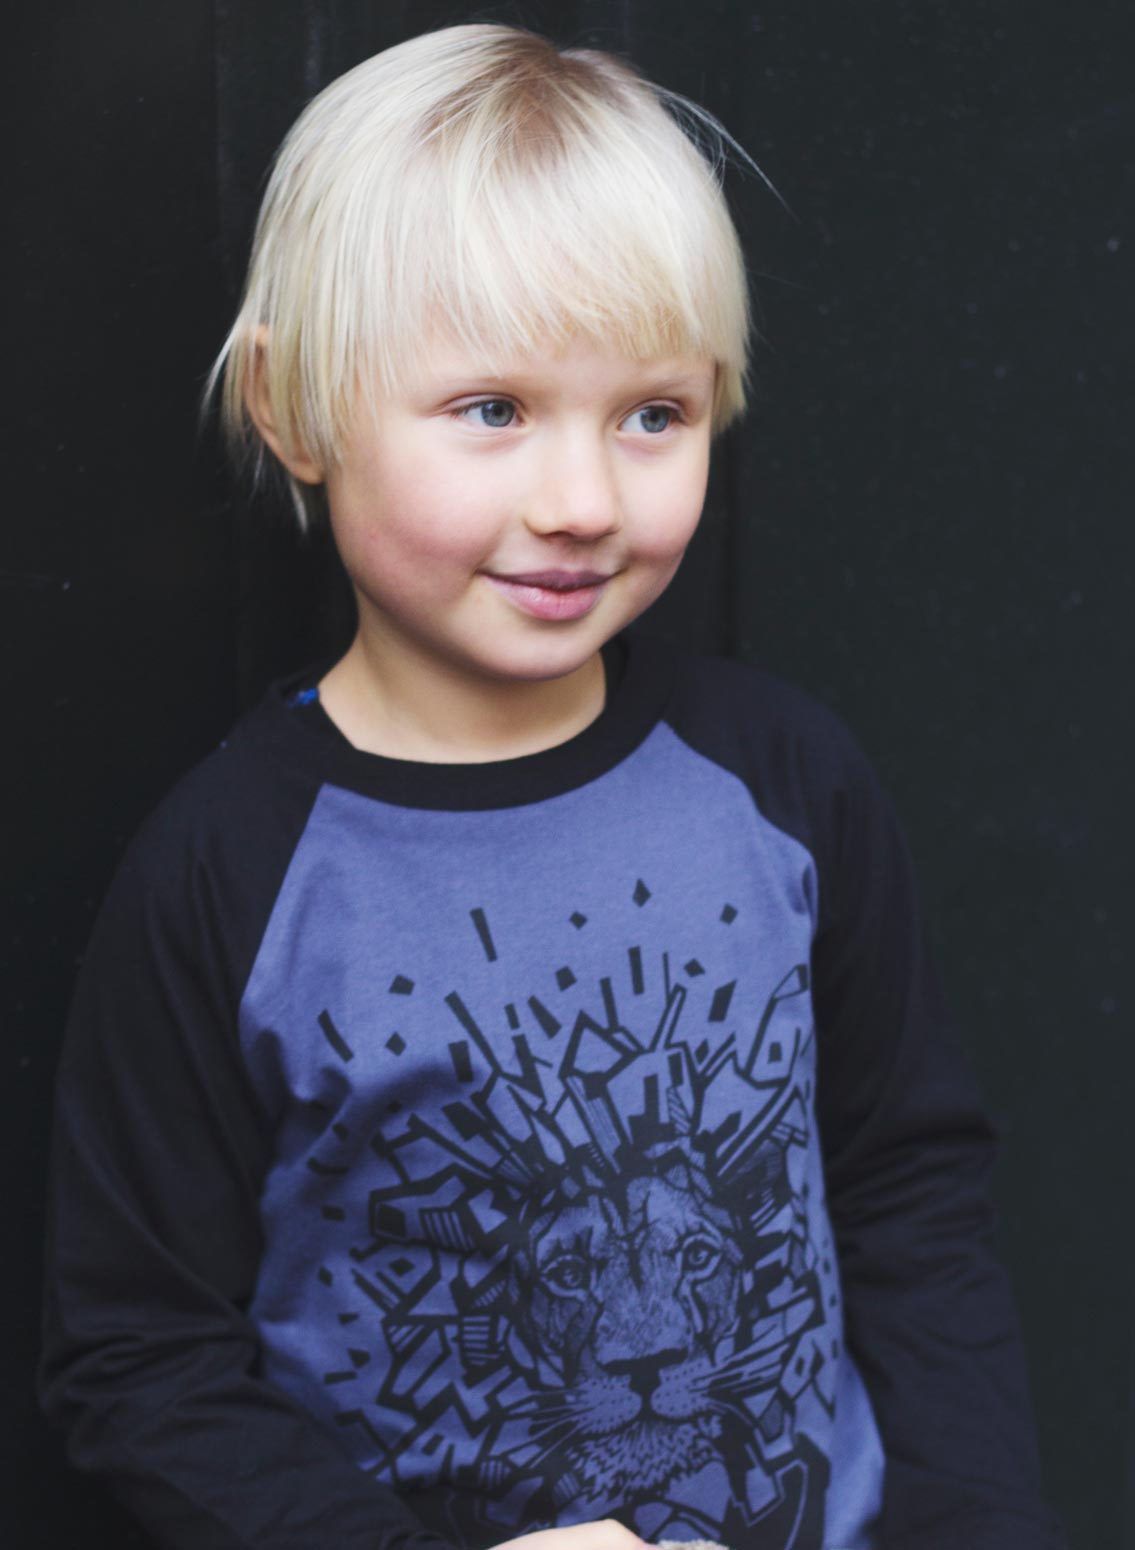 Bobo, øko, T-shirt, LS, gråblå/sort, løve